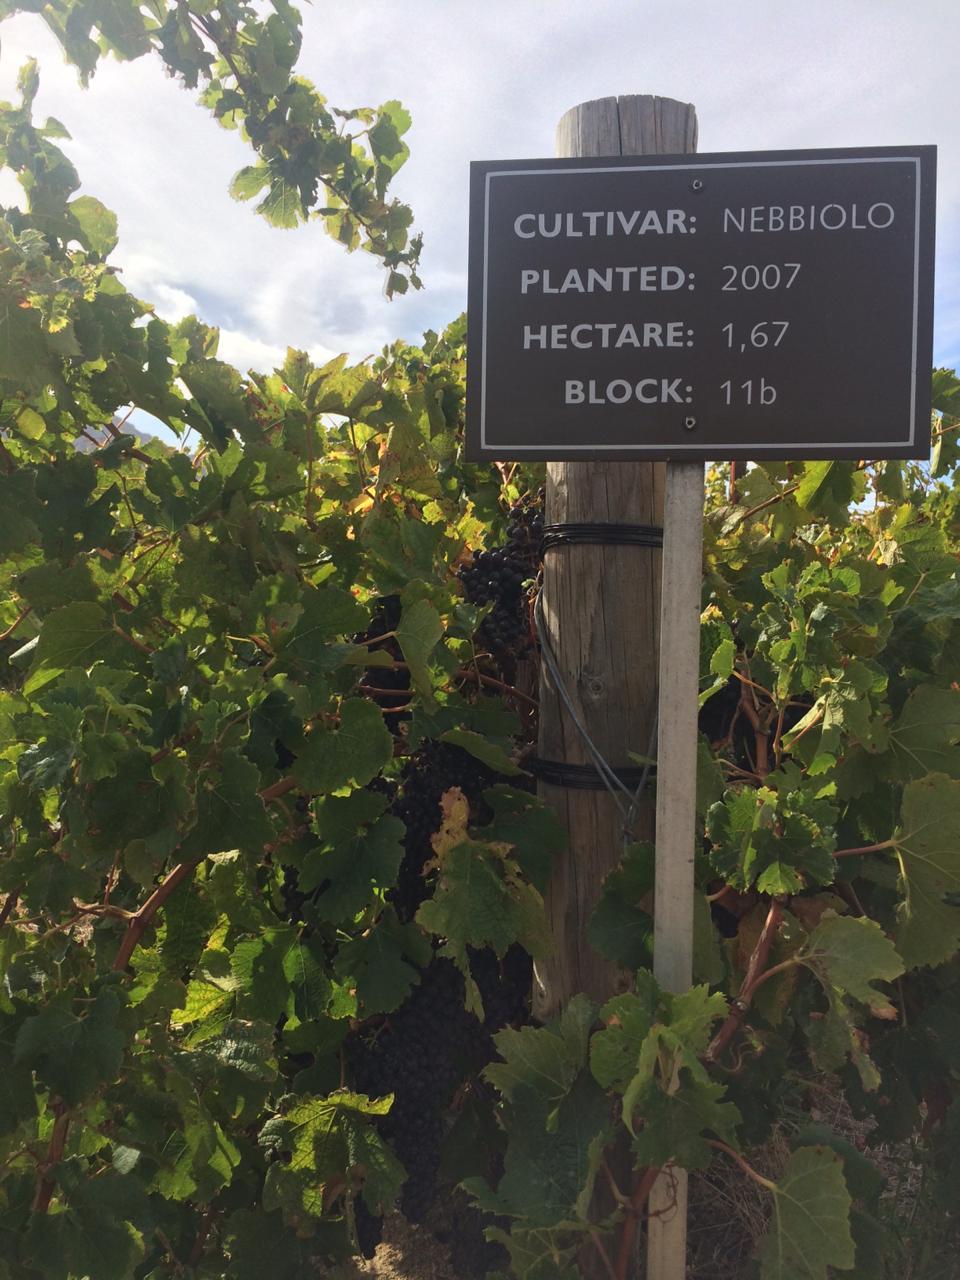 Vitivinicultura sudafricana, un potencial que lo transforma en un gran jugador a nivel internacional